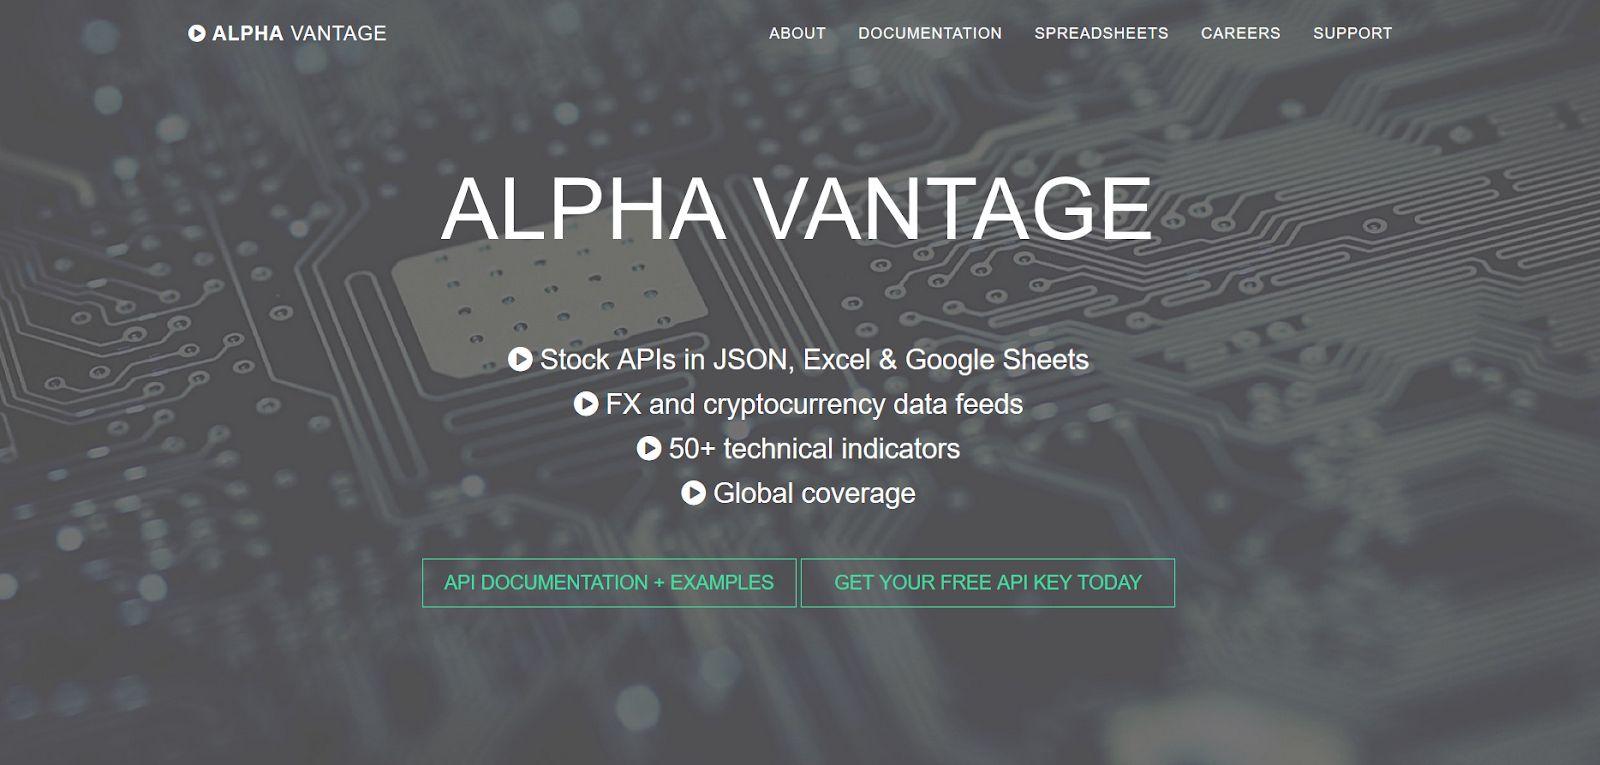 Alpha Vantage Homepage